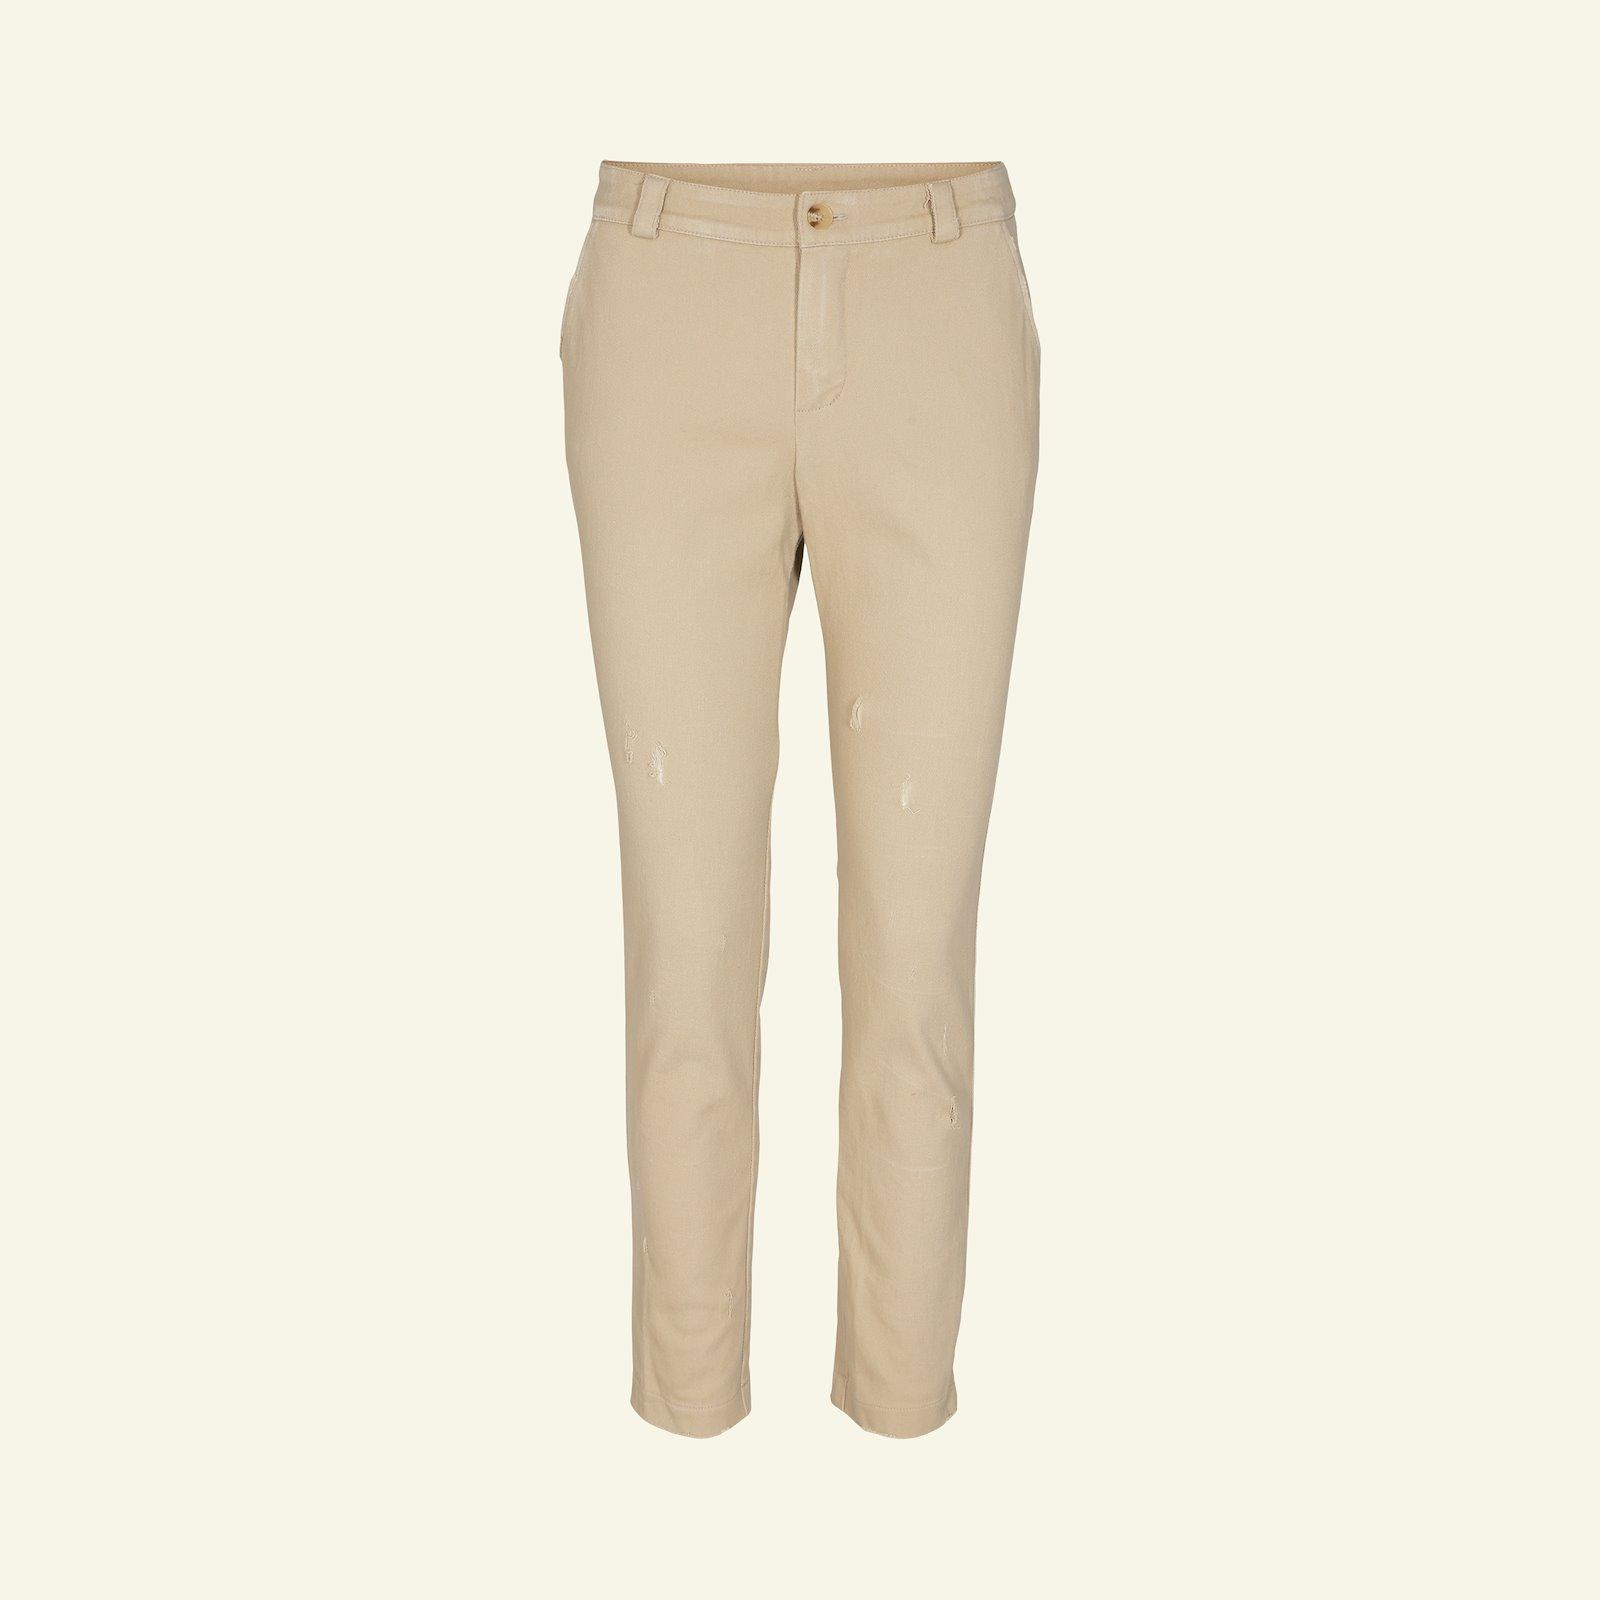 Trousers, 38/10 p20033_460842_sskit